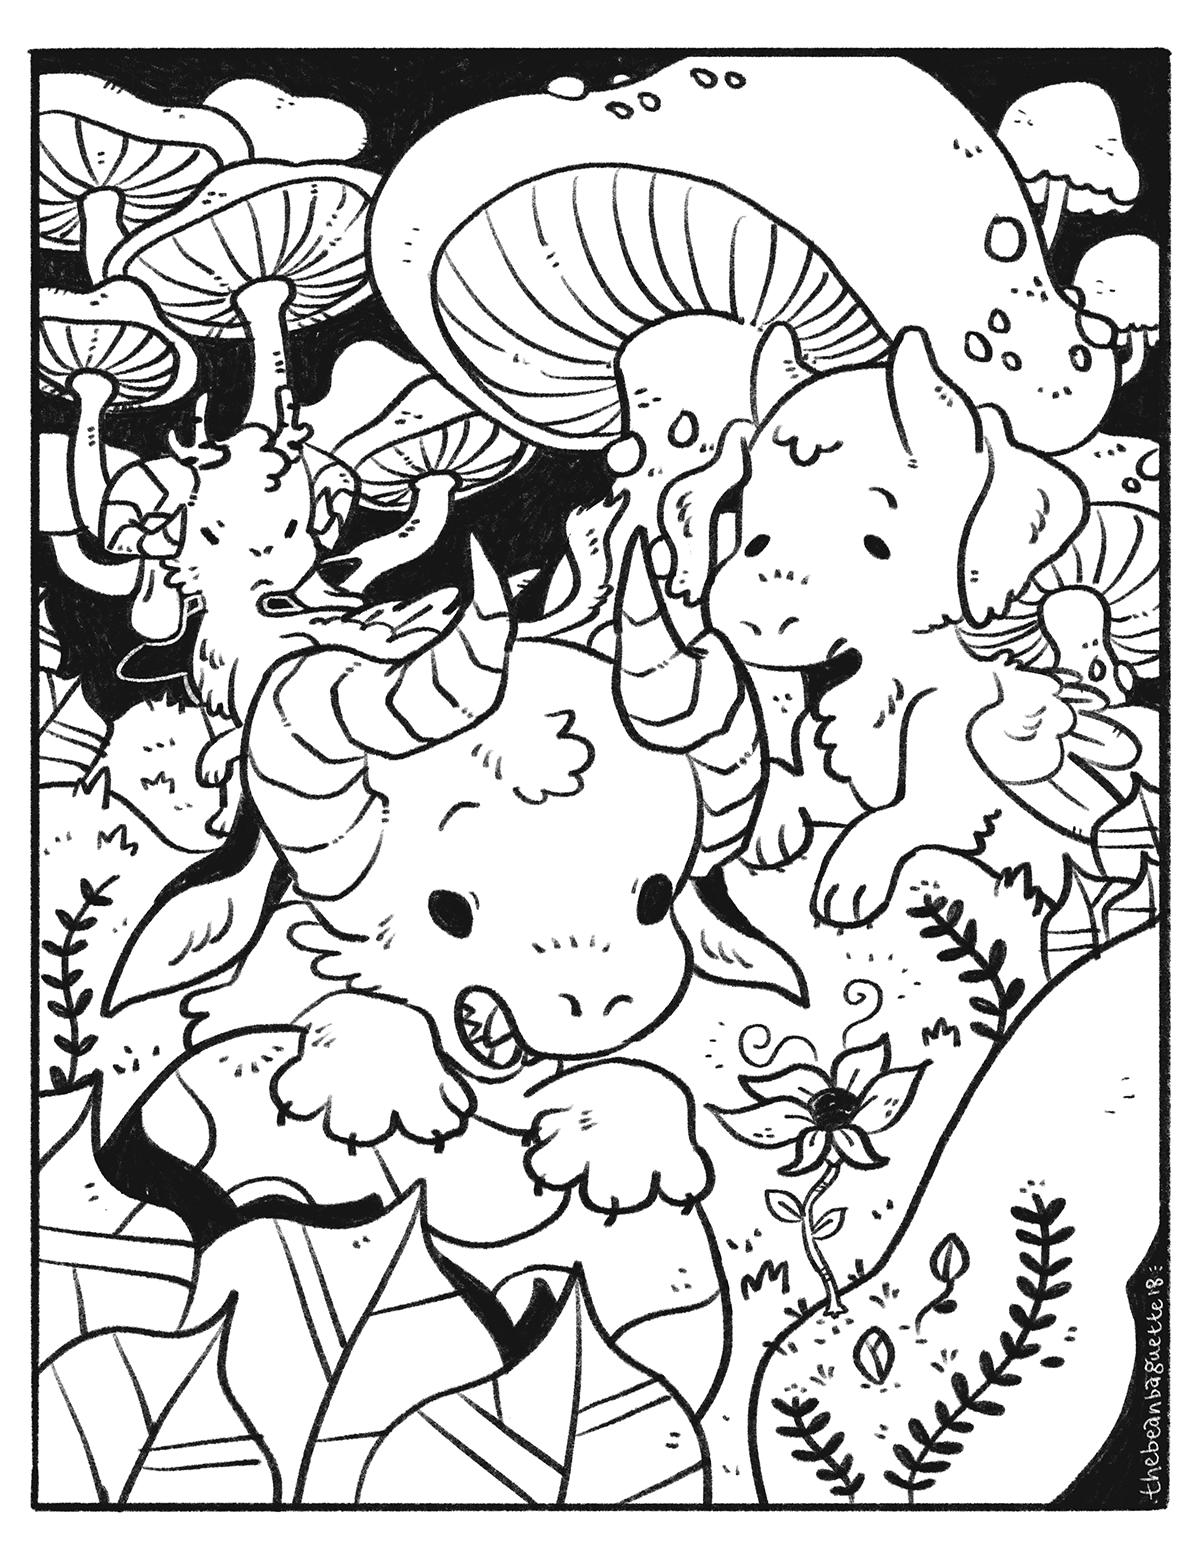 bbaguette feb2018 coloring page -- mushroom hunters.png